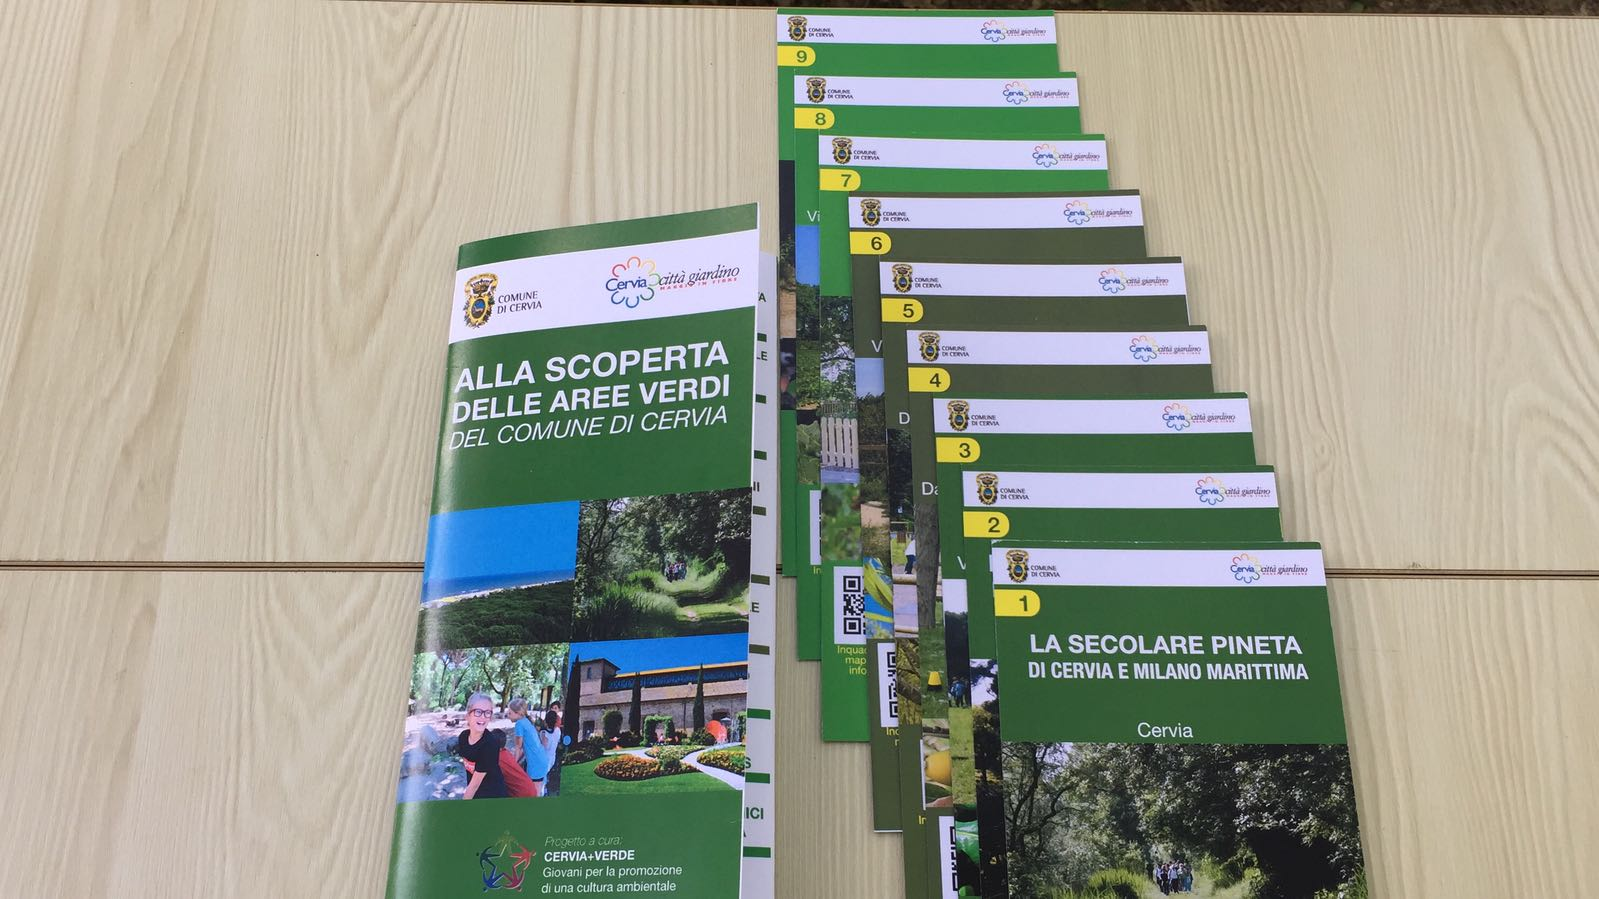 Ufficio Verde Cervia : Rustici casali e case di corte in vendita a cervia ra